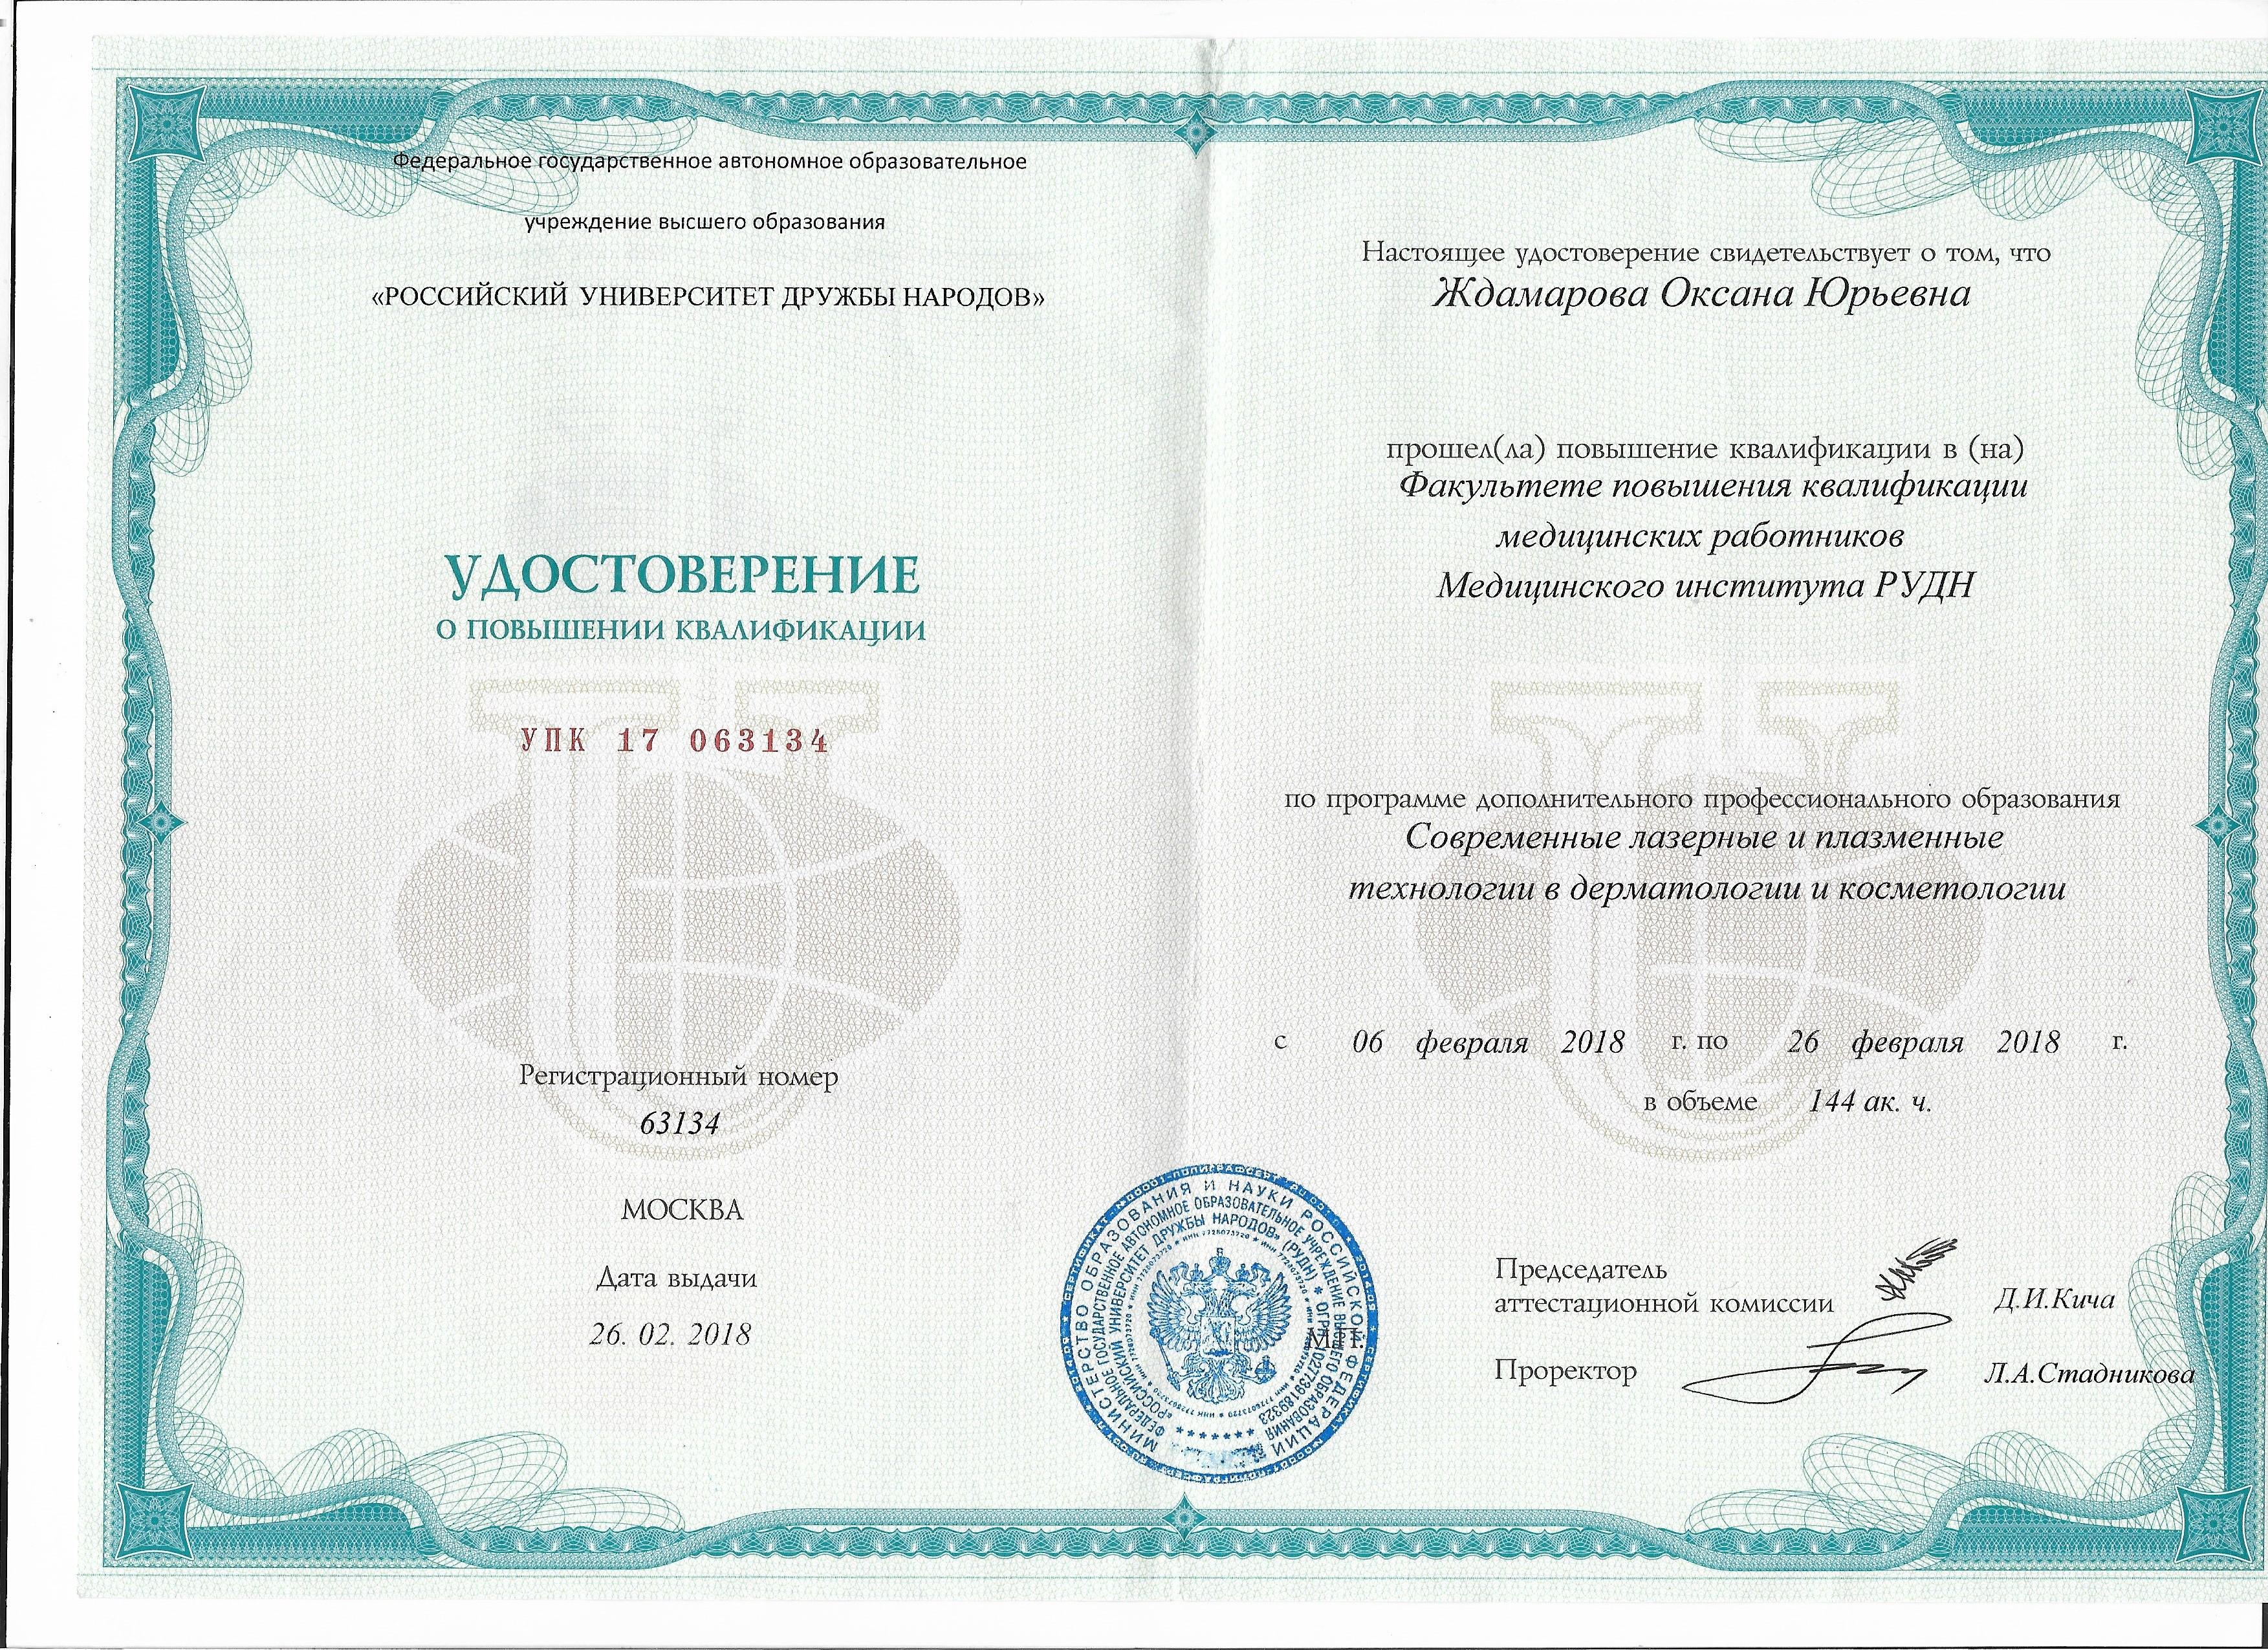 Ждамарова Оксана Юрьевна